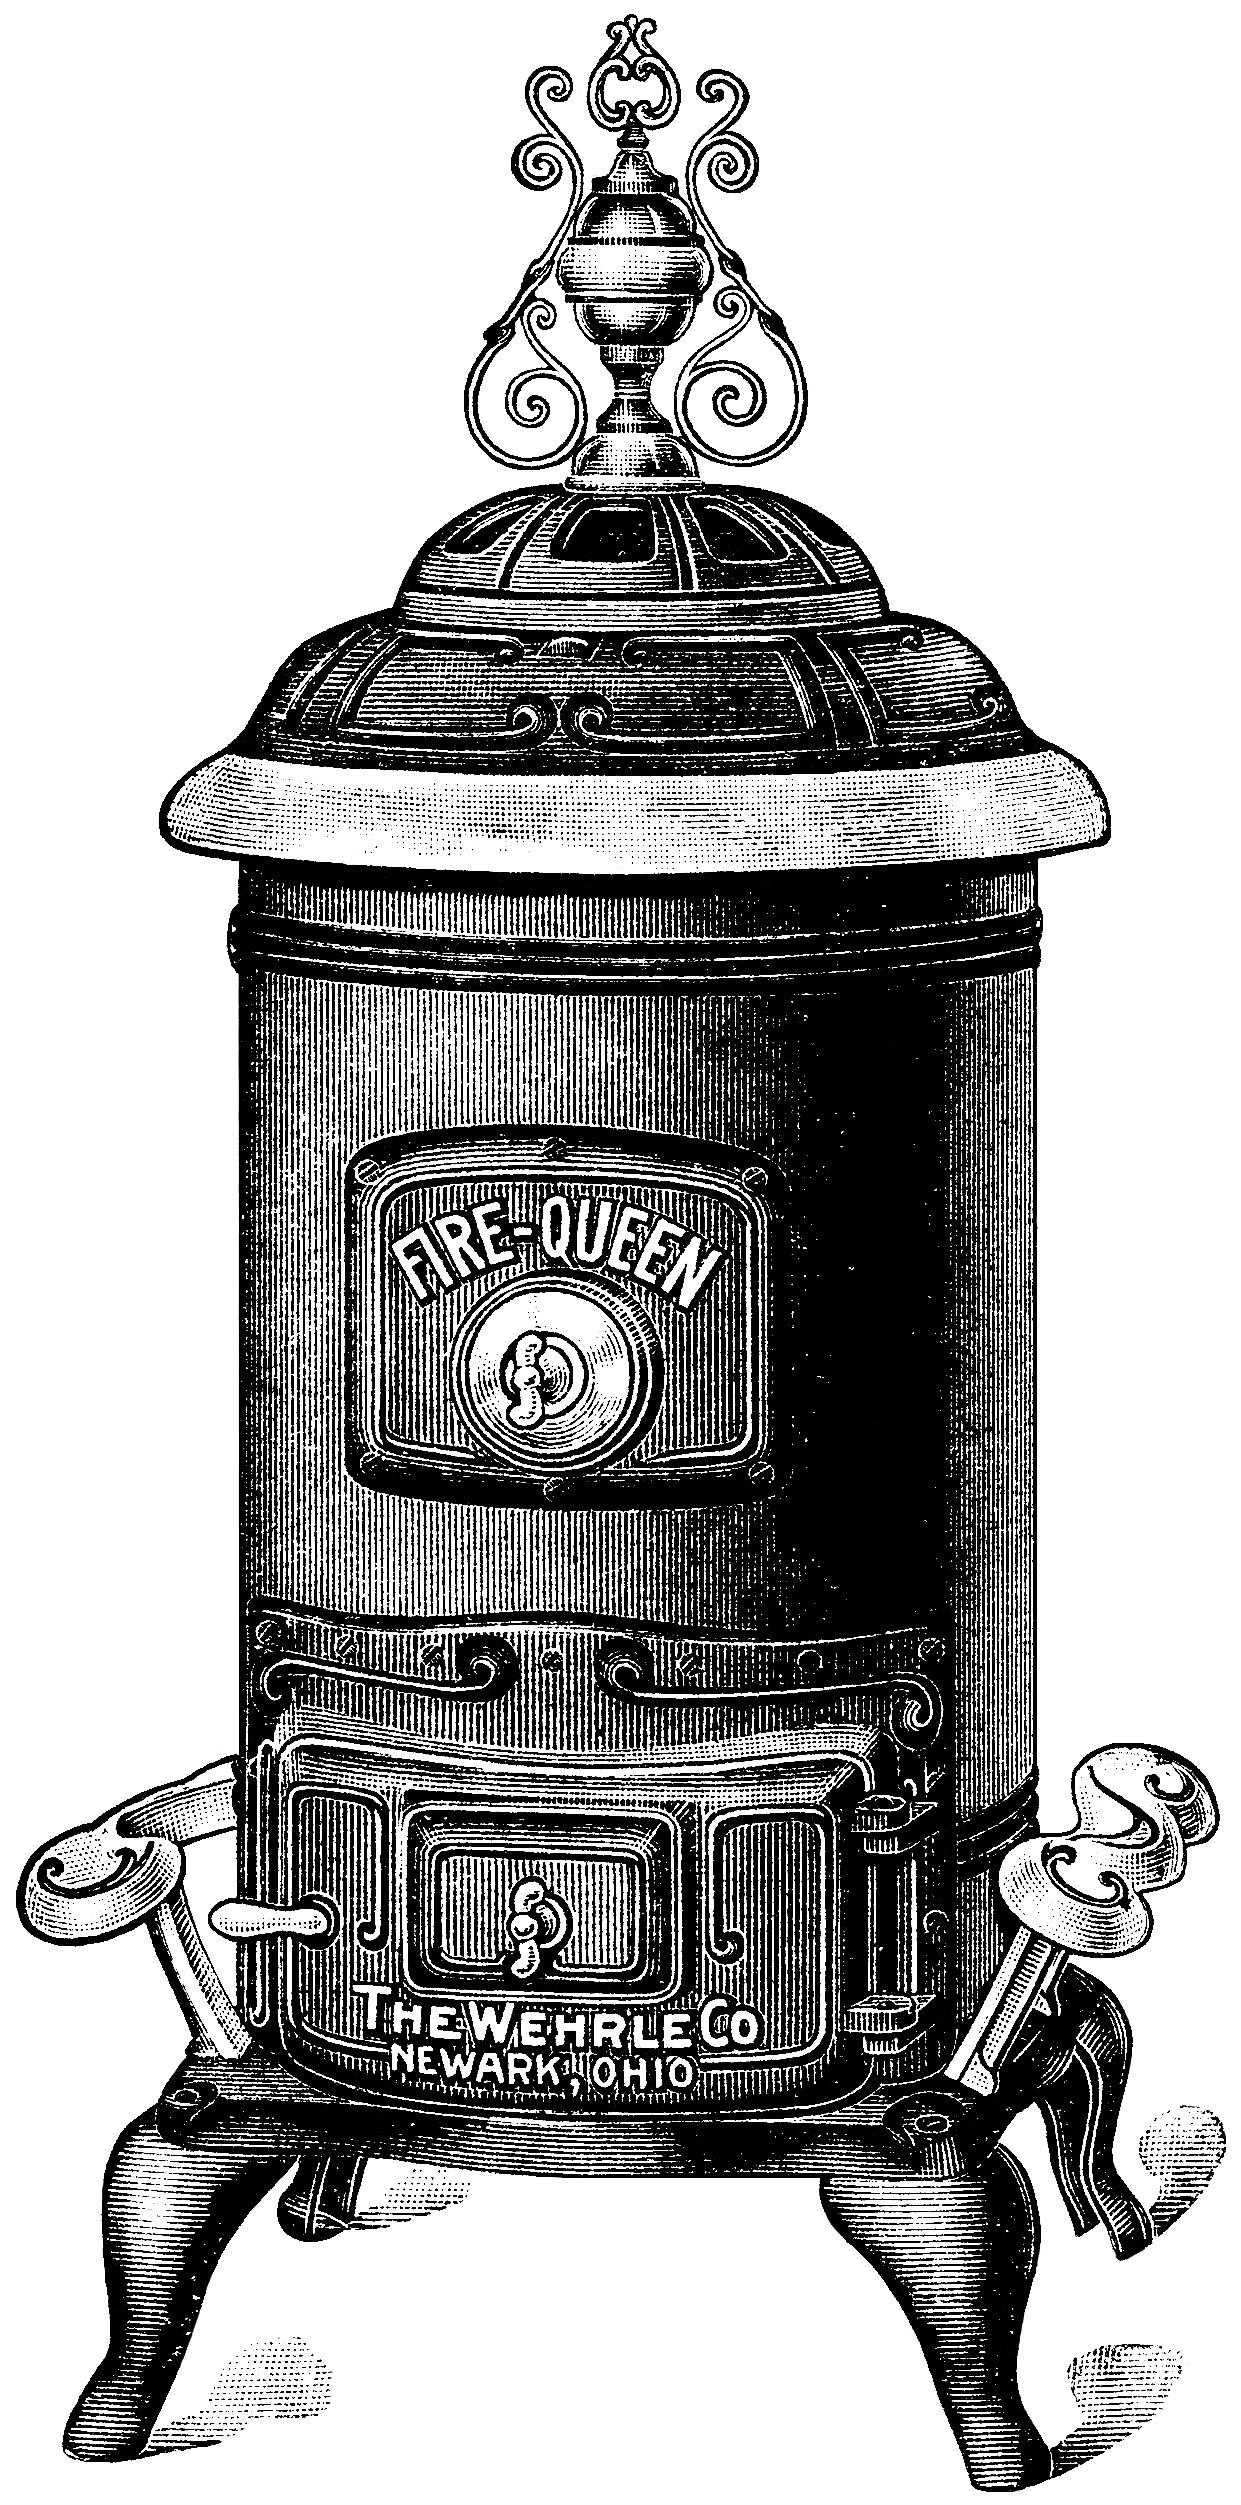 Fire Queen stove, antique stove ad, black and white clip art.